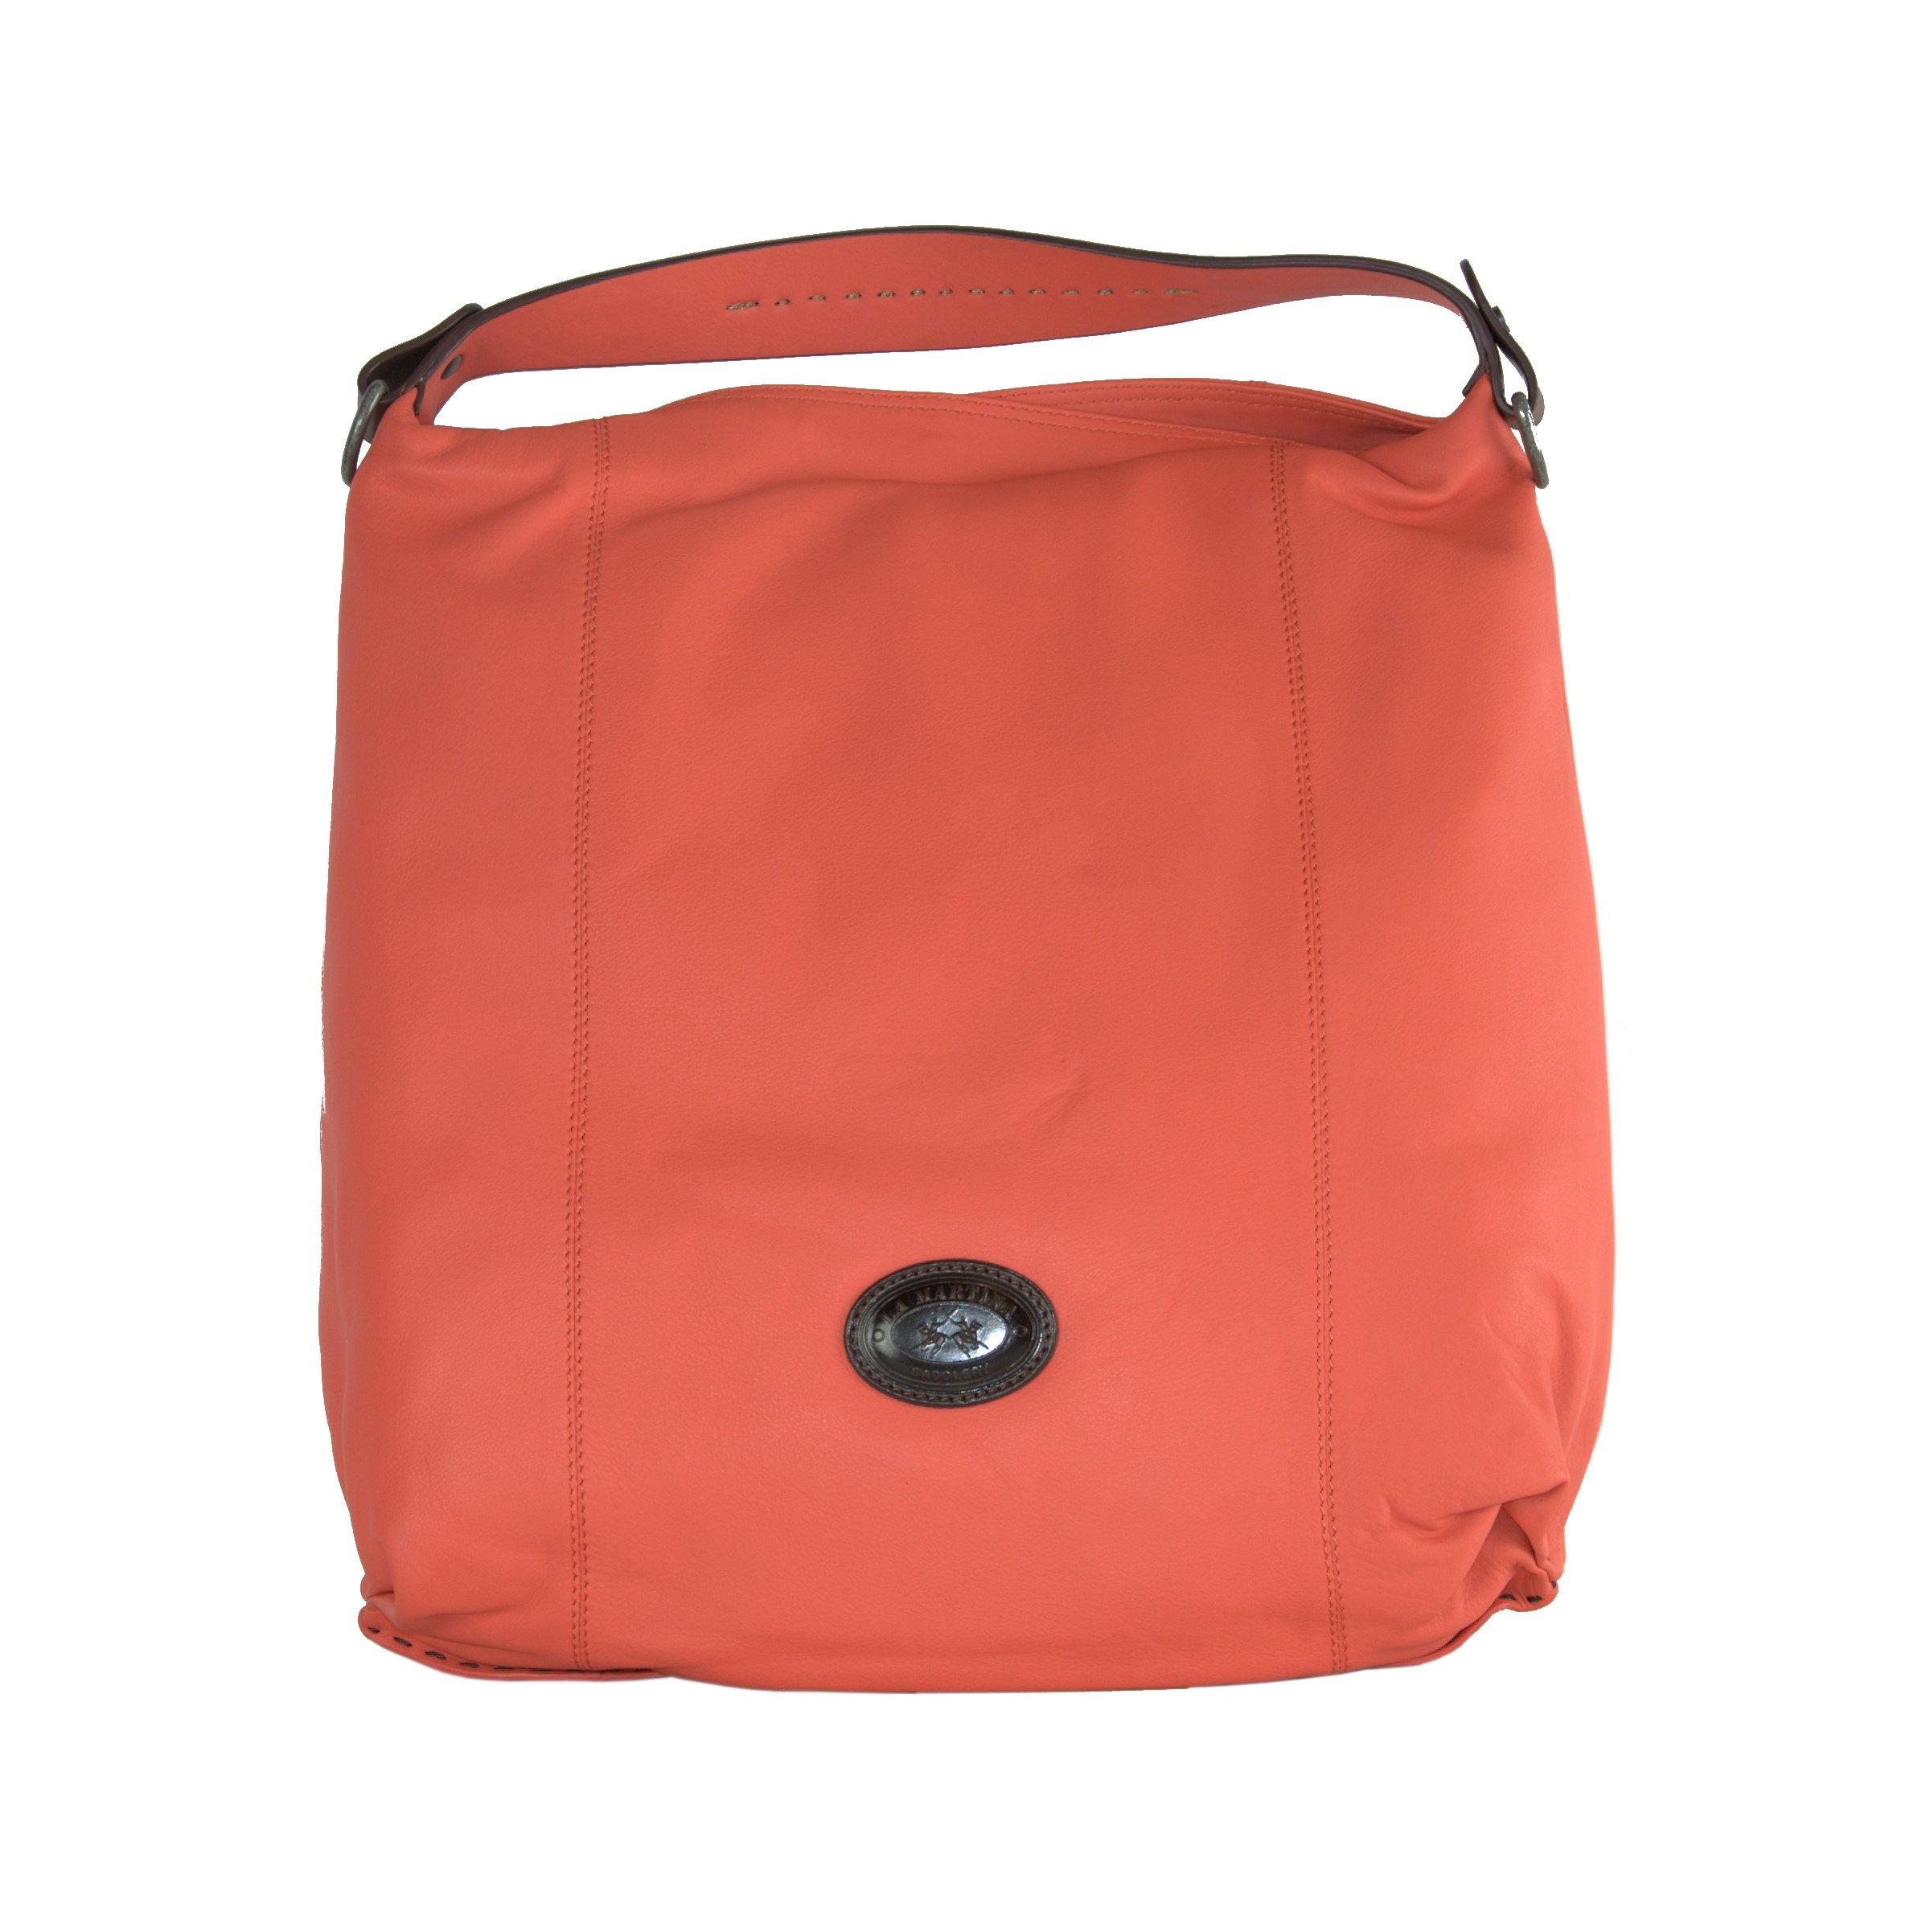 La Martina Women's Handbag Coral LA1421309